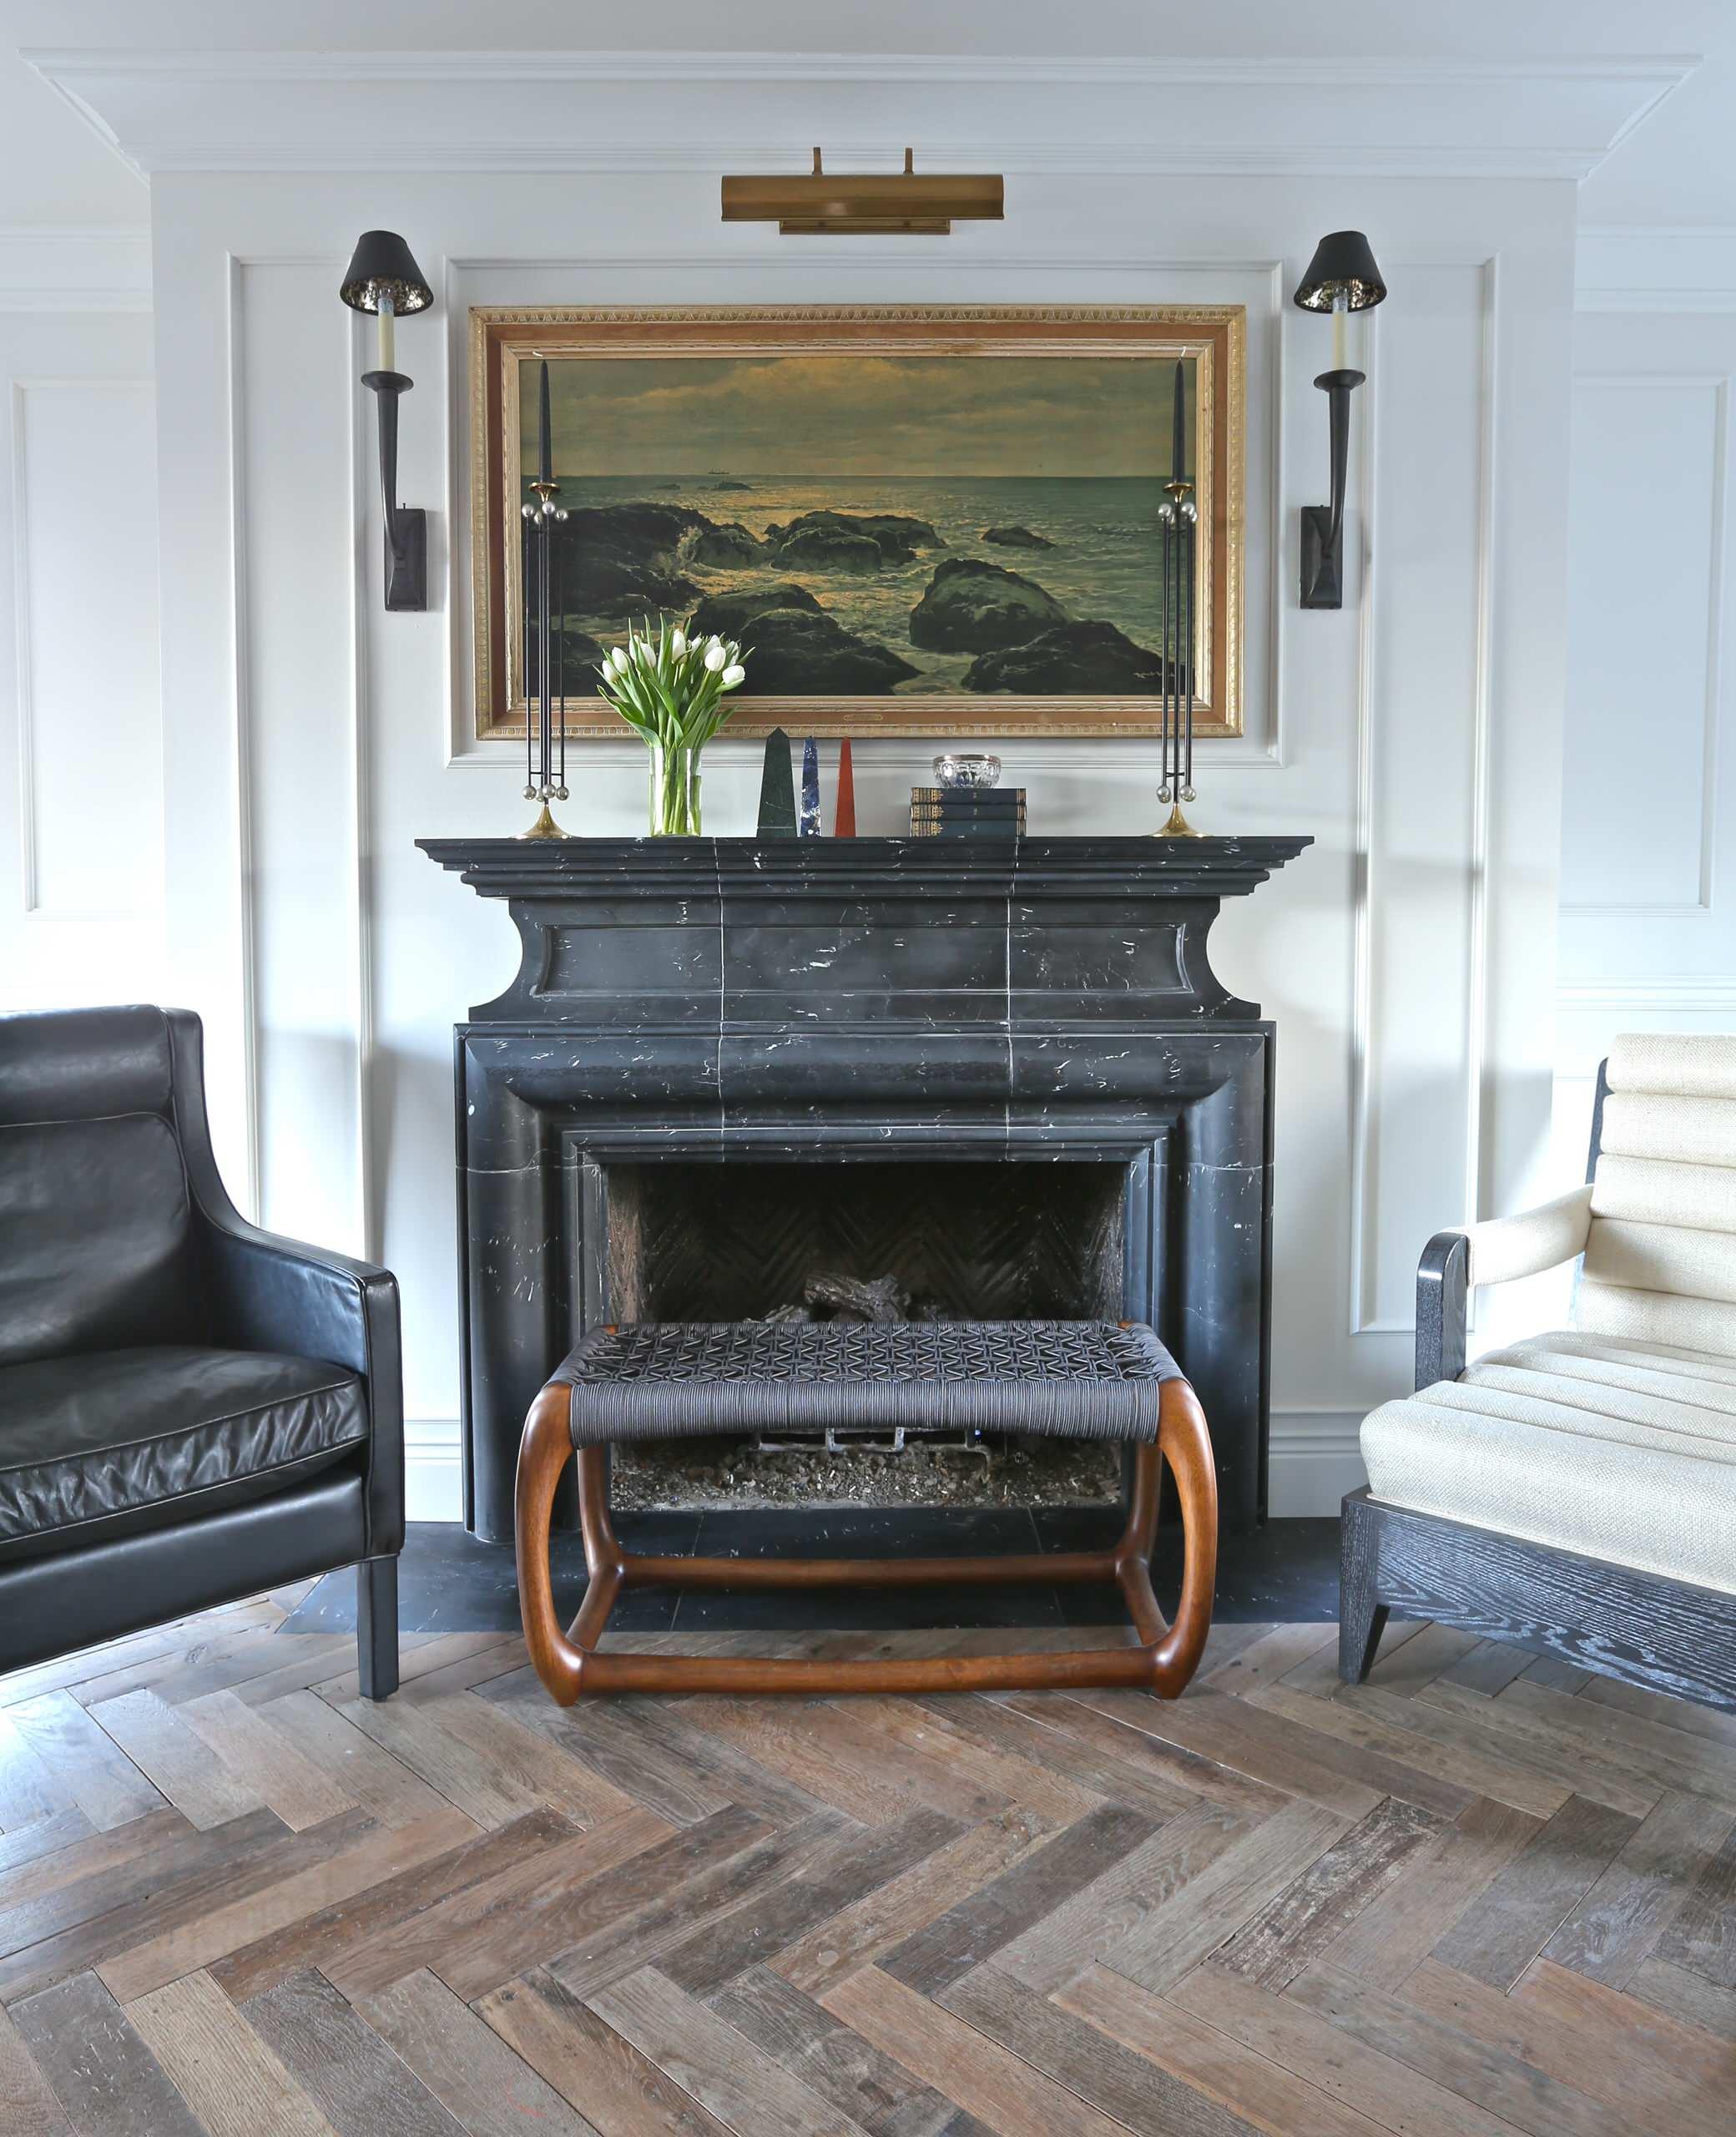 Black Marble Fireplace Houzz, Black Marble Fireplace Surround Ideas